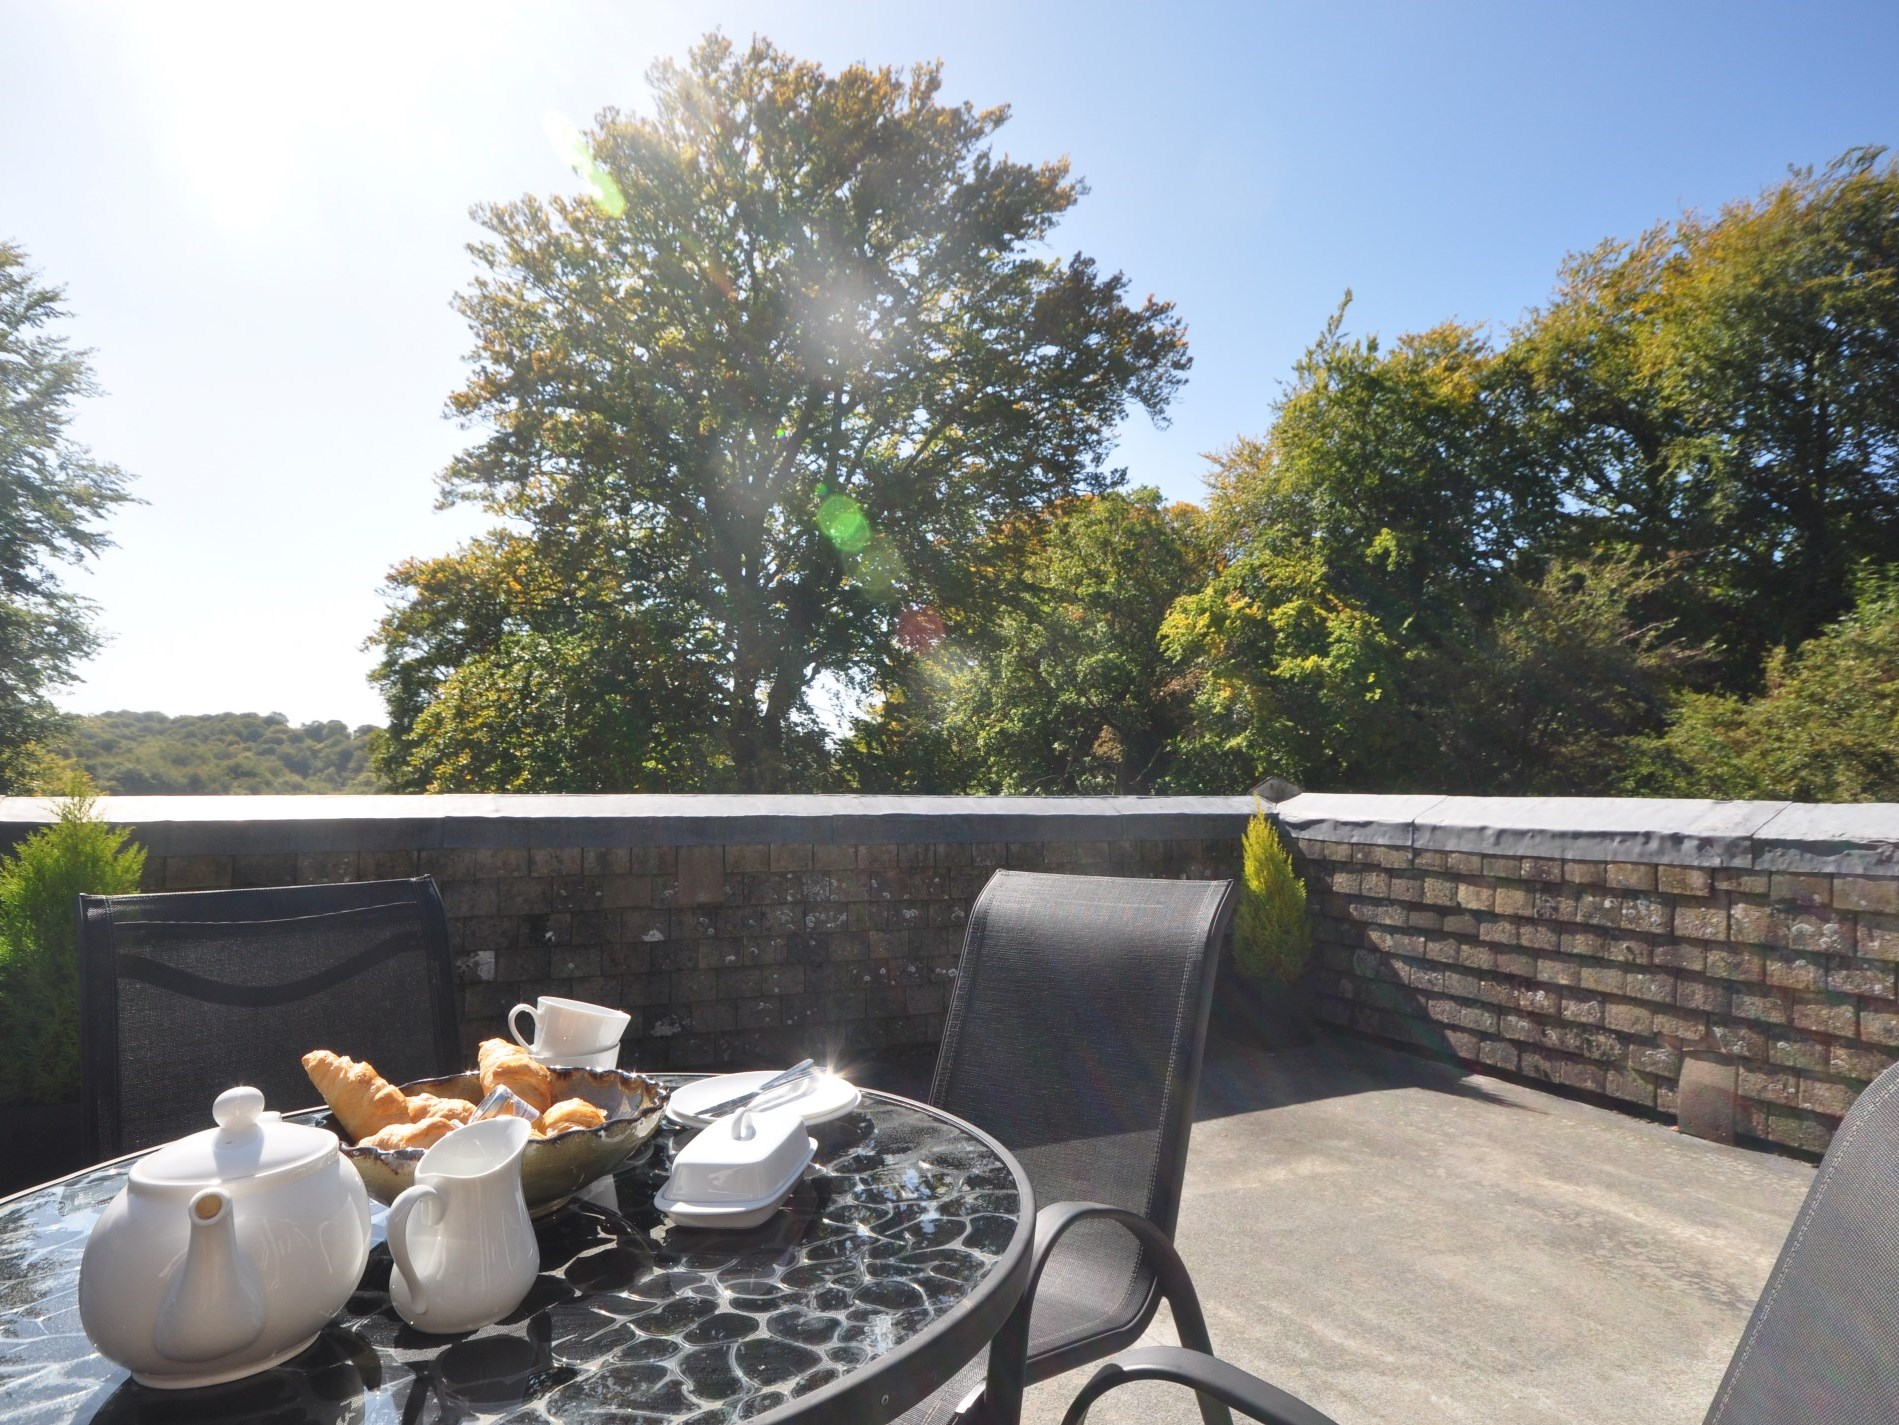 Breakfast on the roof top terrace